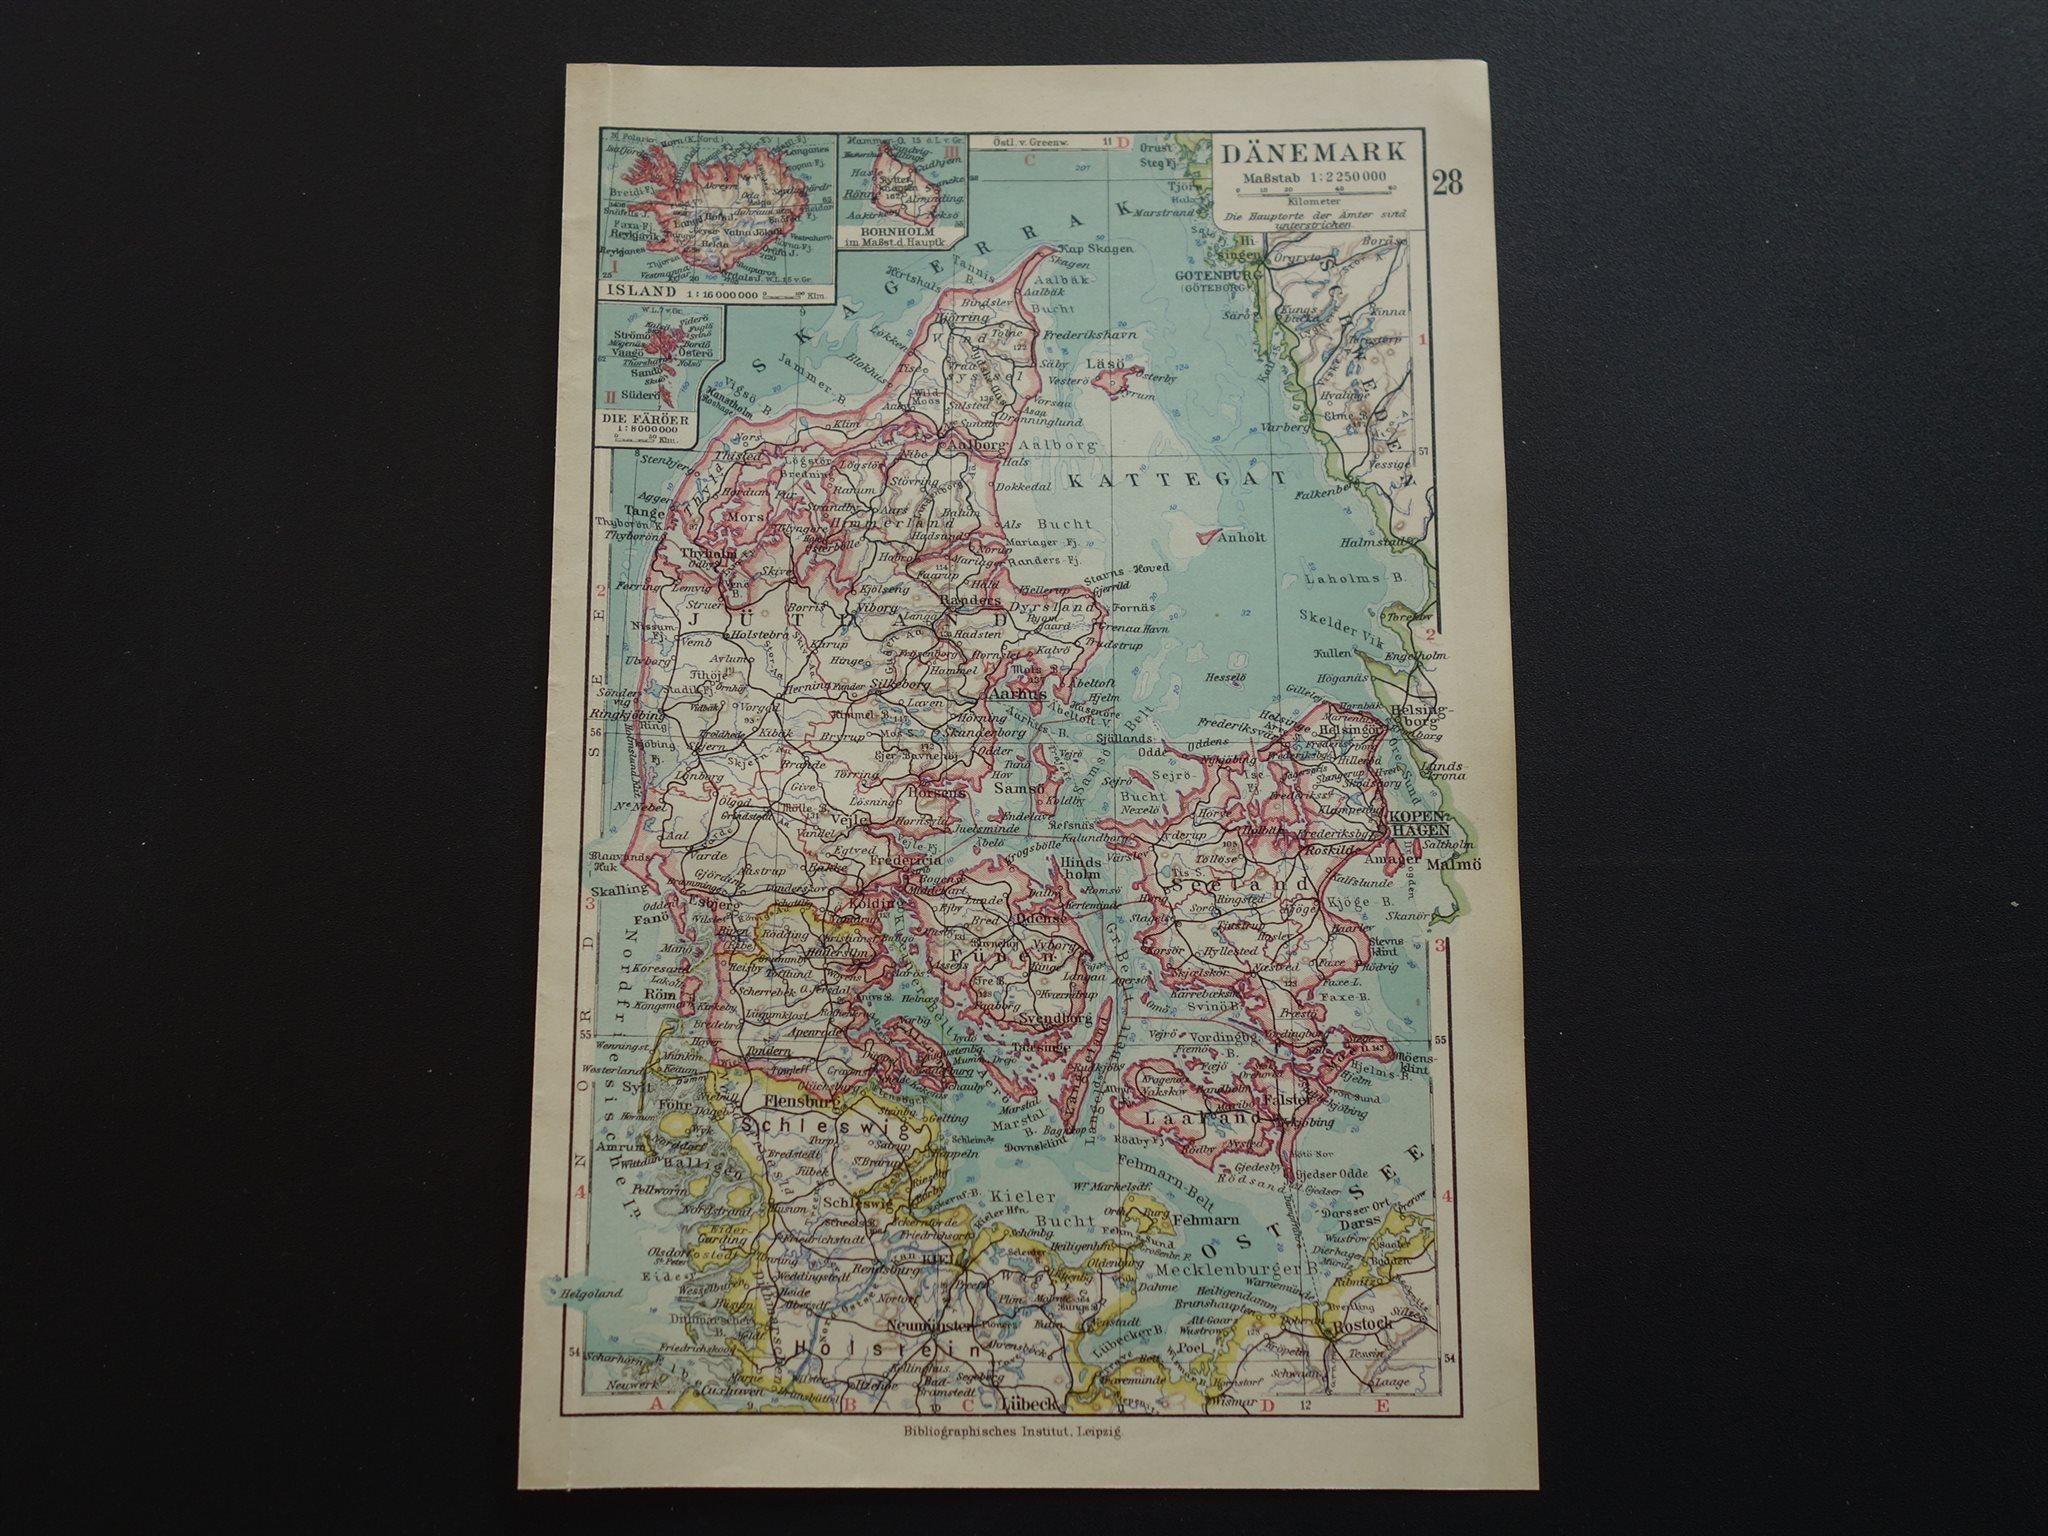 Karta Sodra Danmark.1926 Antik Gammal Karta Over Danmark Denmark 24 348333095 ᐈ Kop